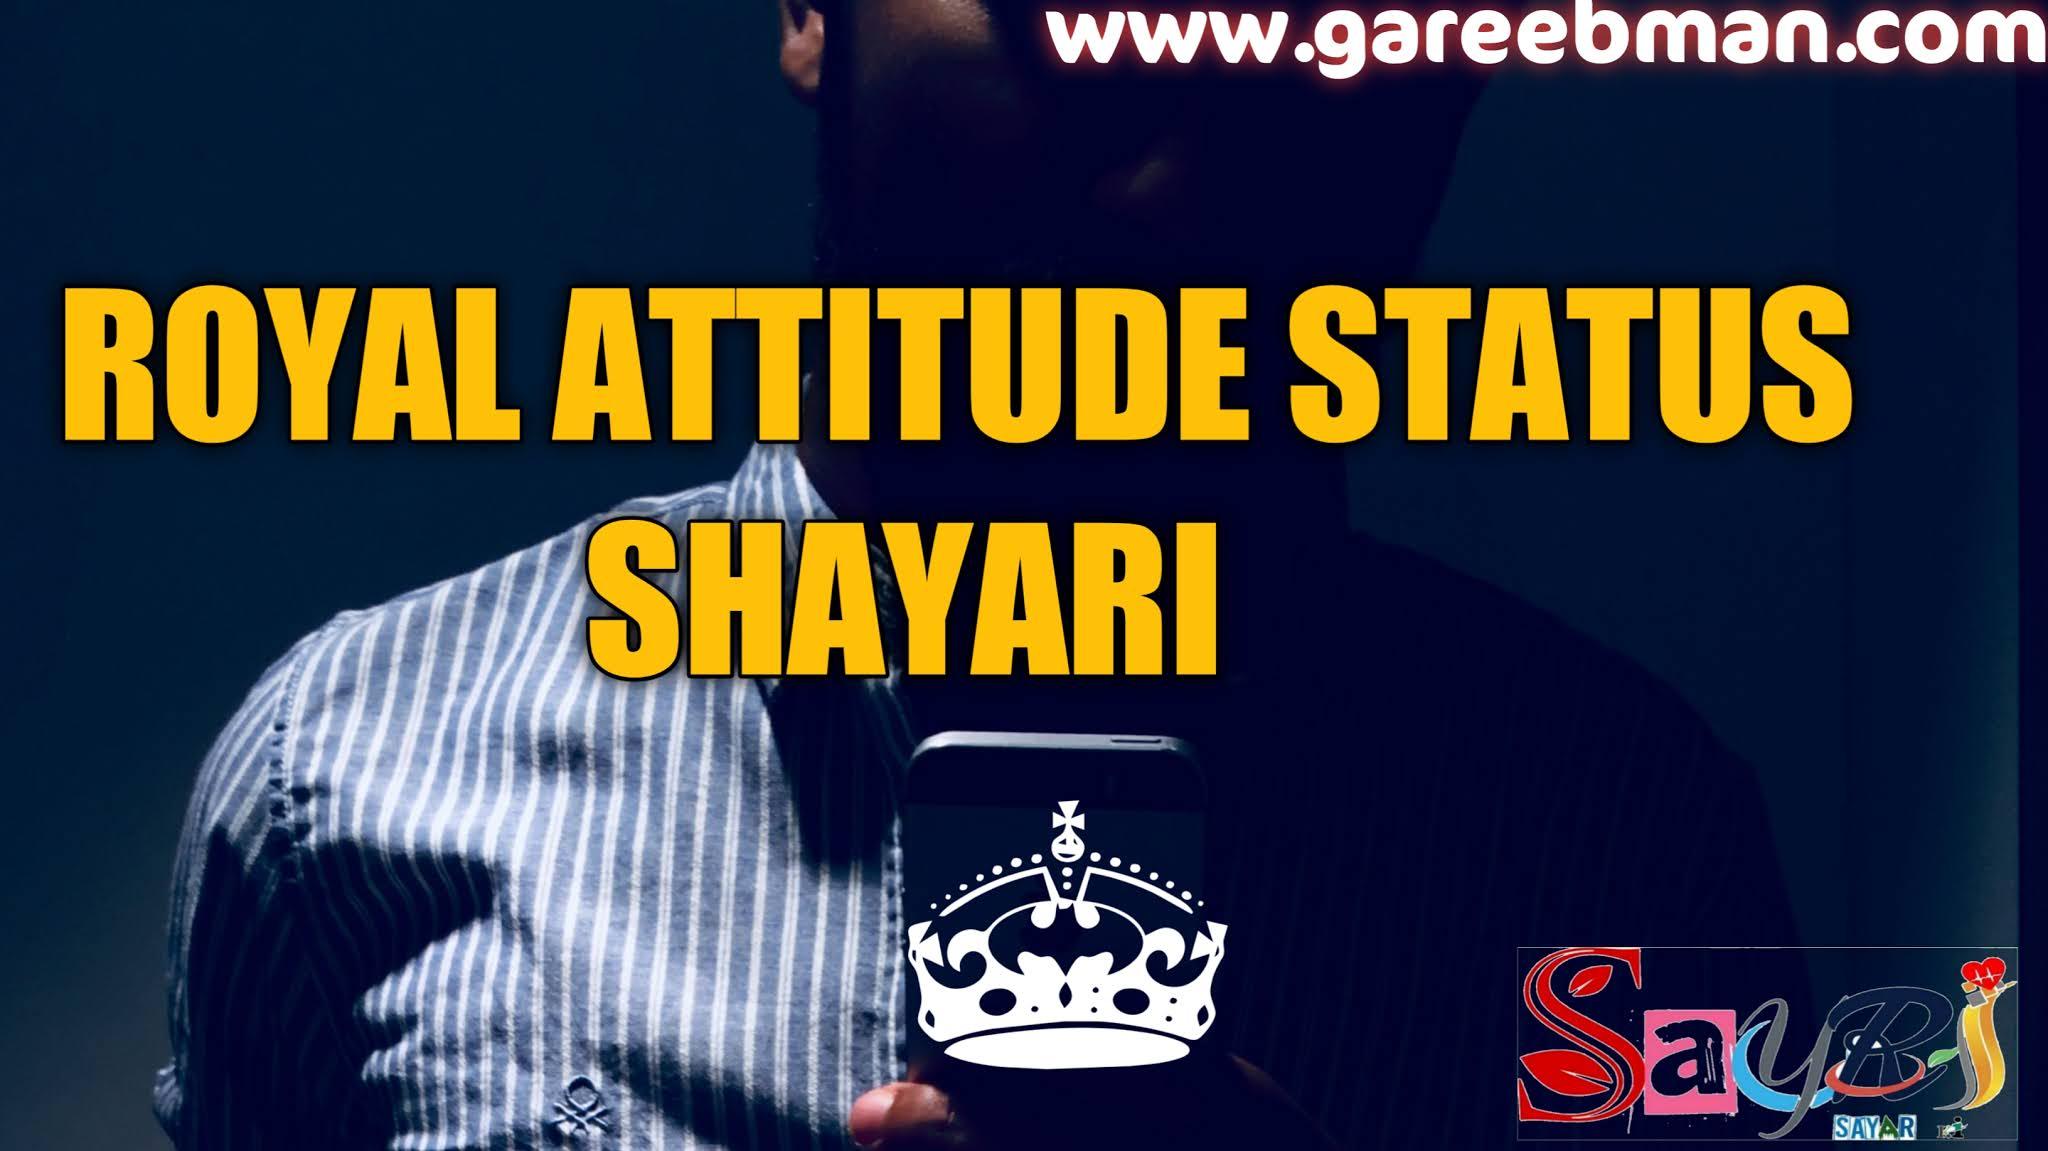 Royal attitude status image hd